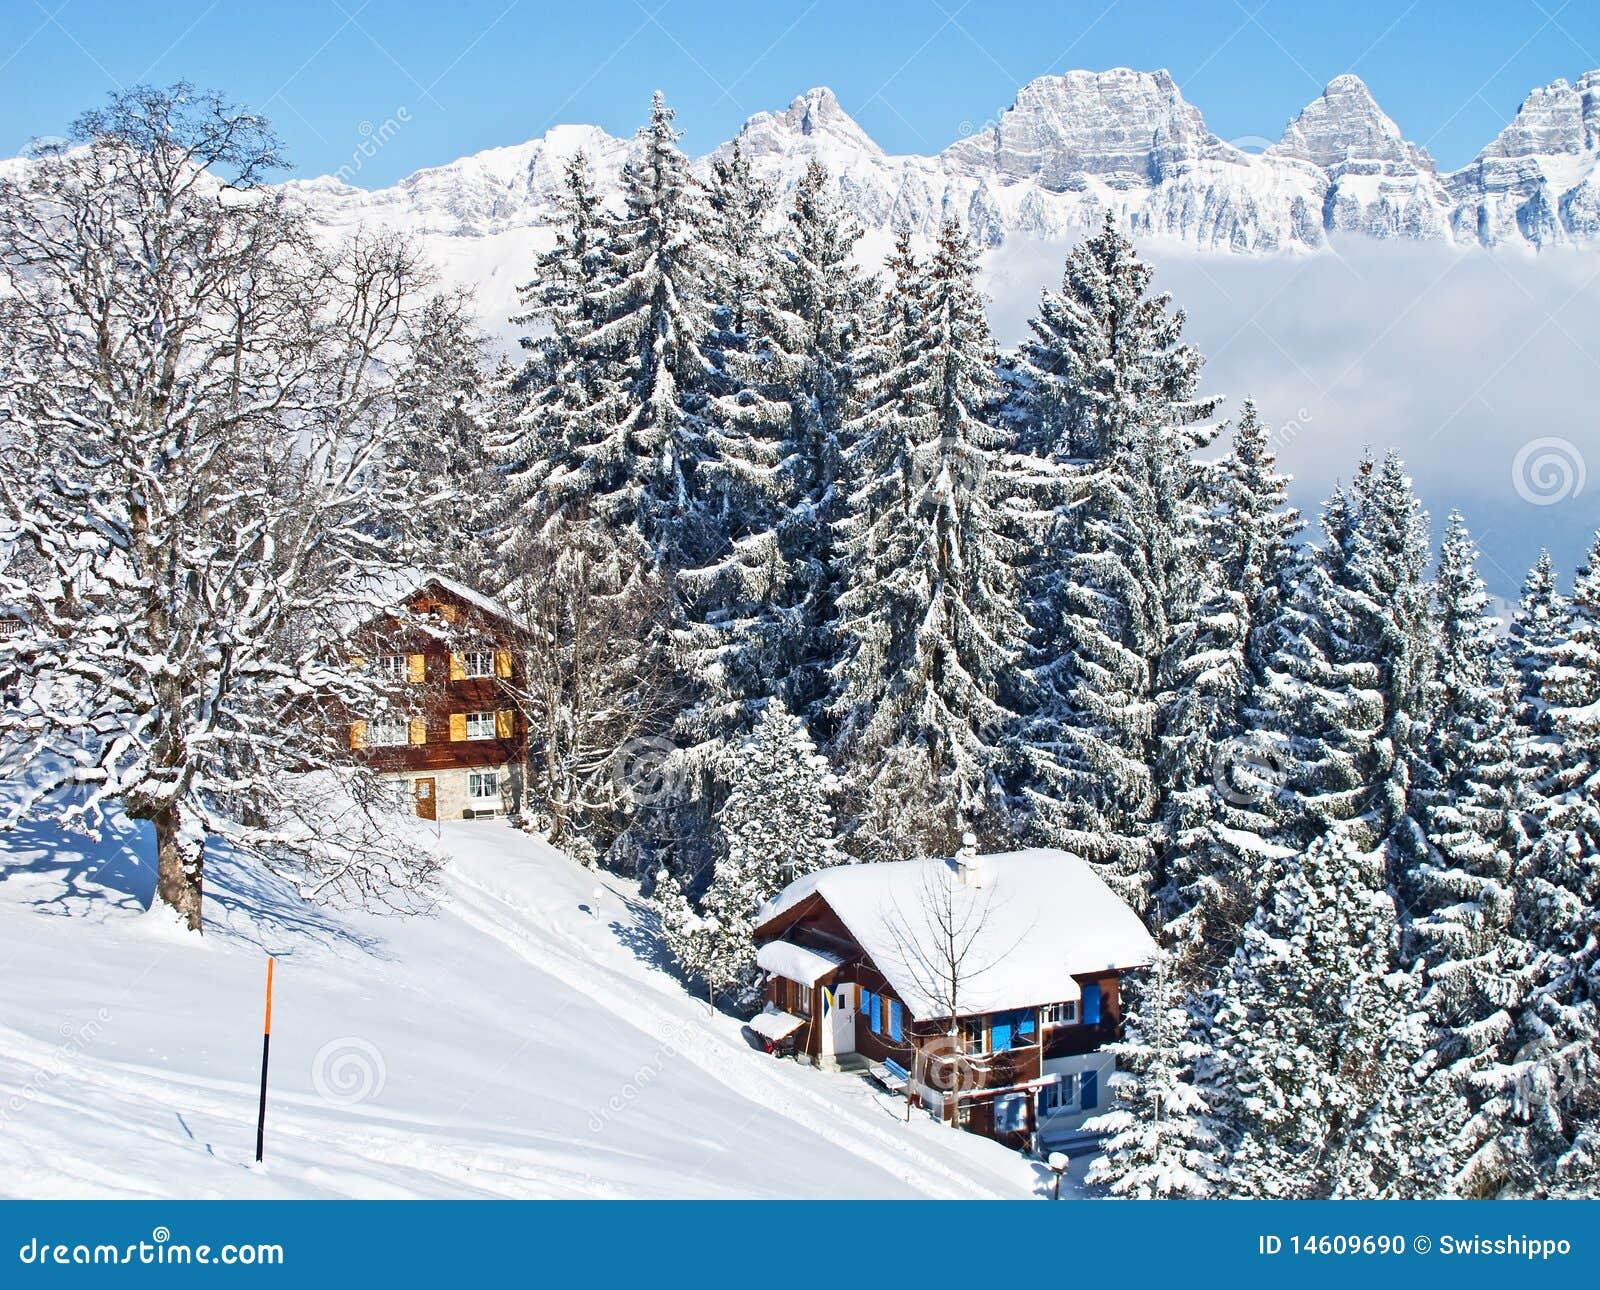 Winter Holiday House Stock Photo Image 14609690